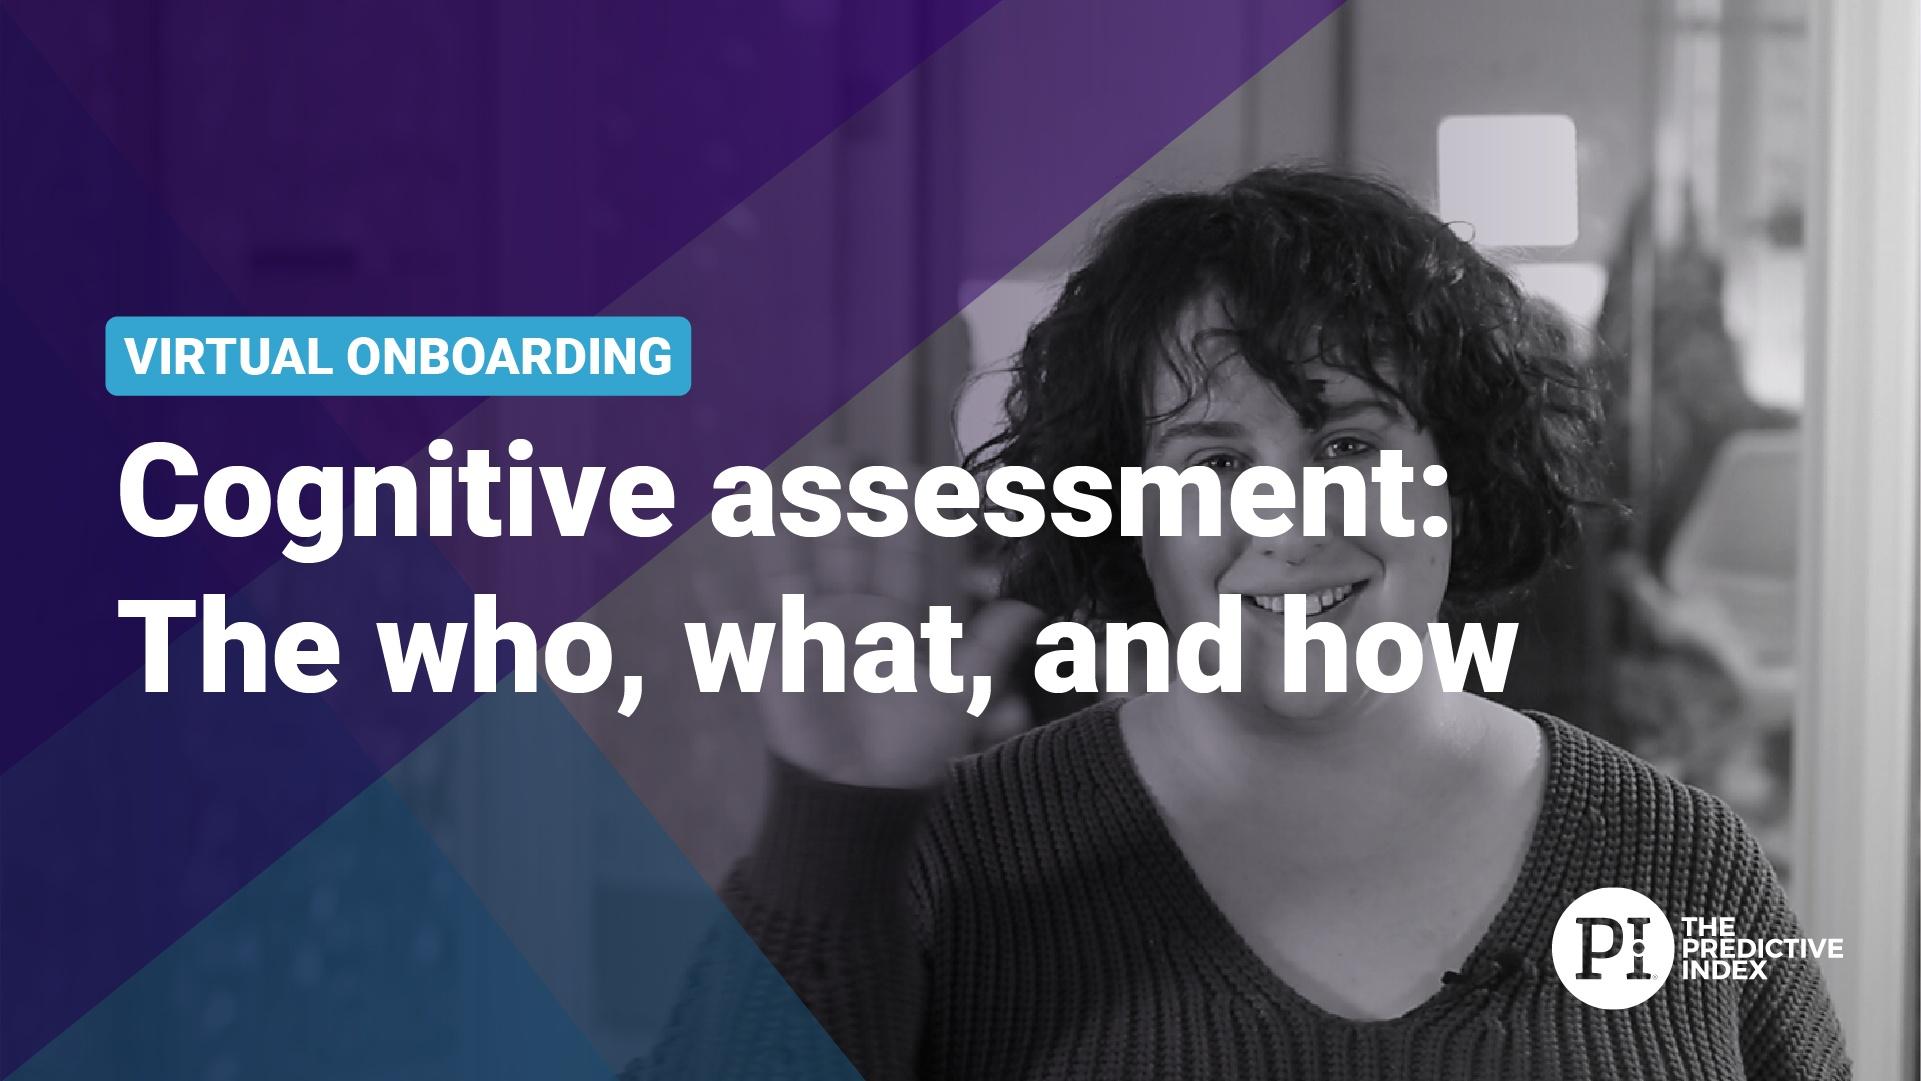 Virtual Onboarding | PI Cognitive Assessment